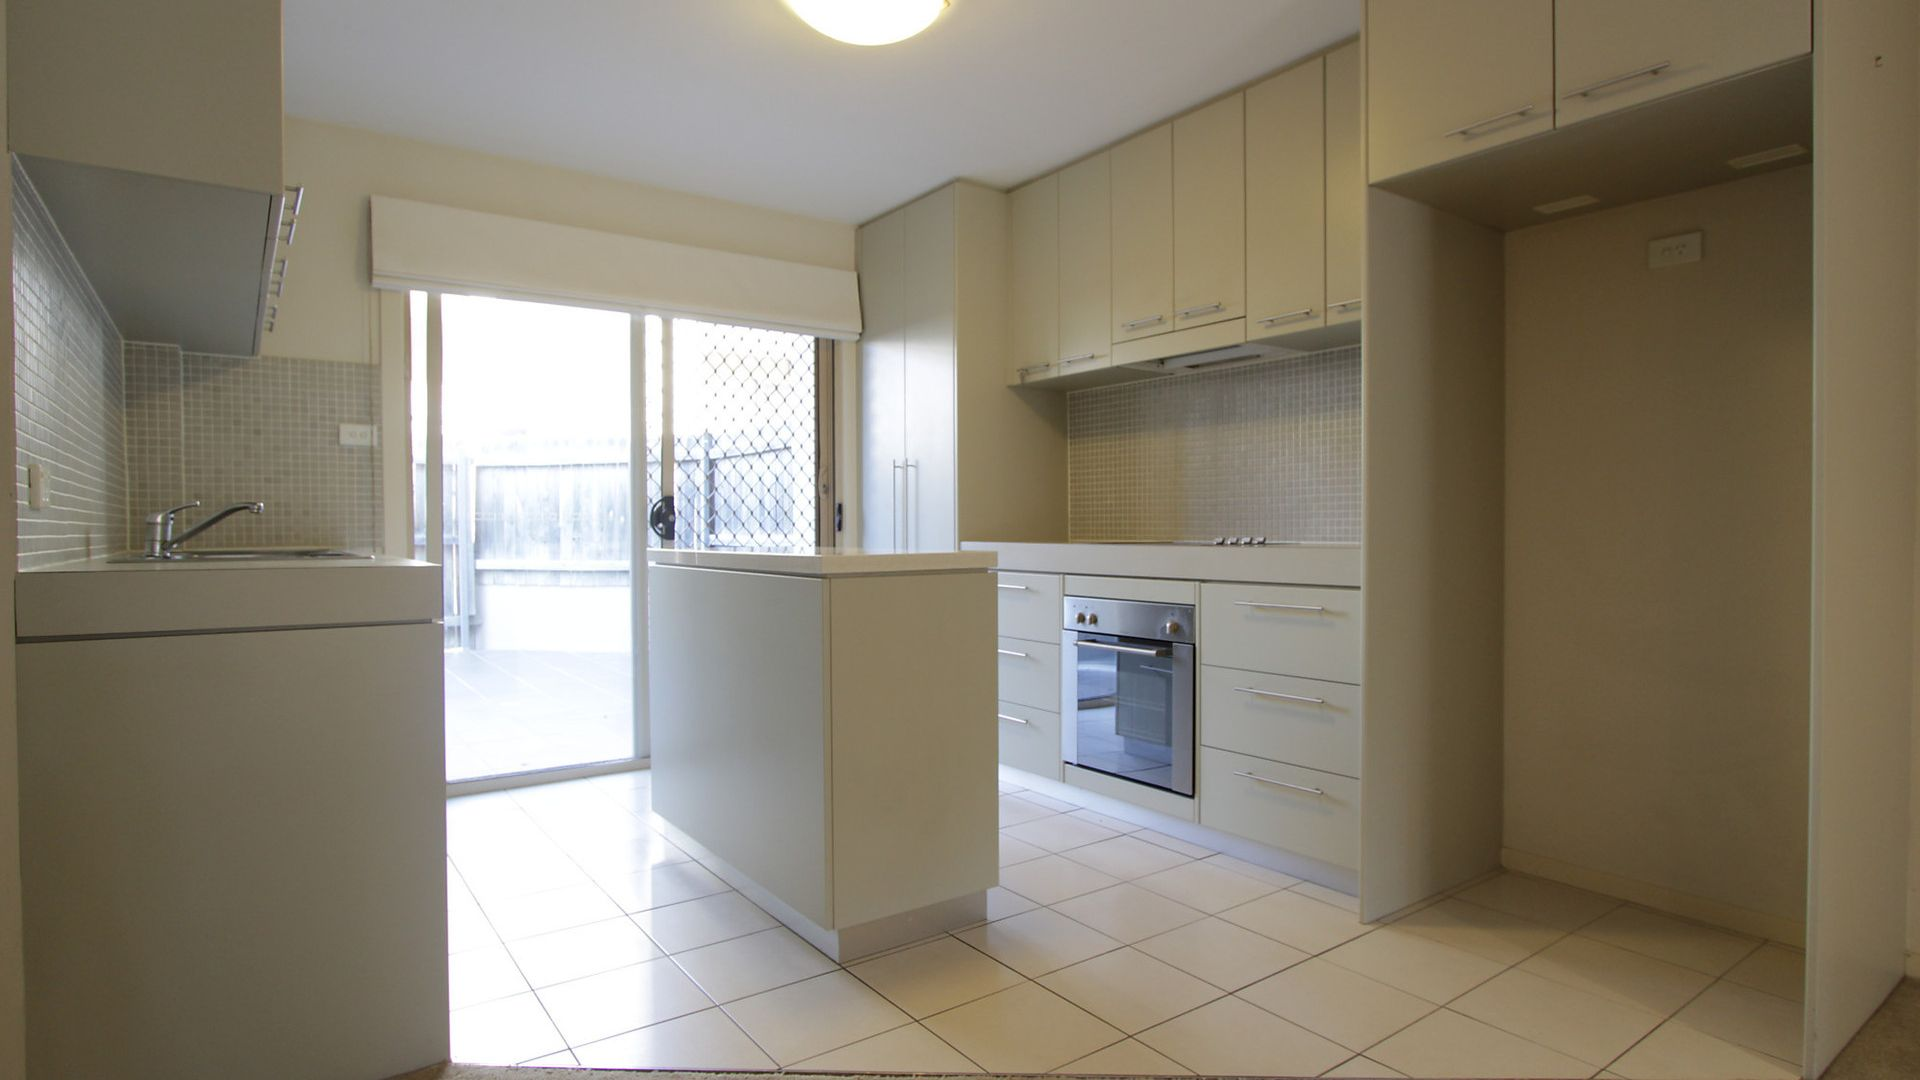 14/43 Antill Street, Queanbeyan NSW 2620, Image 2